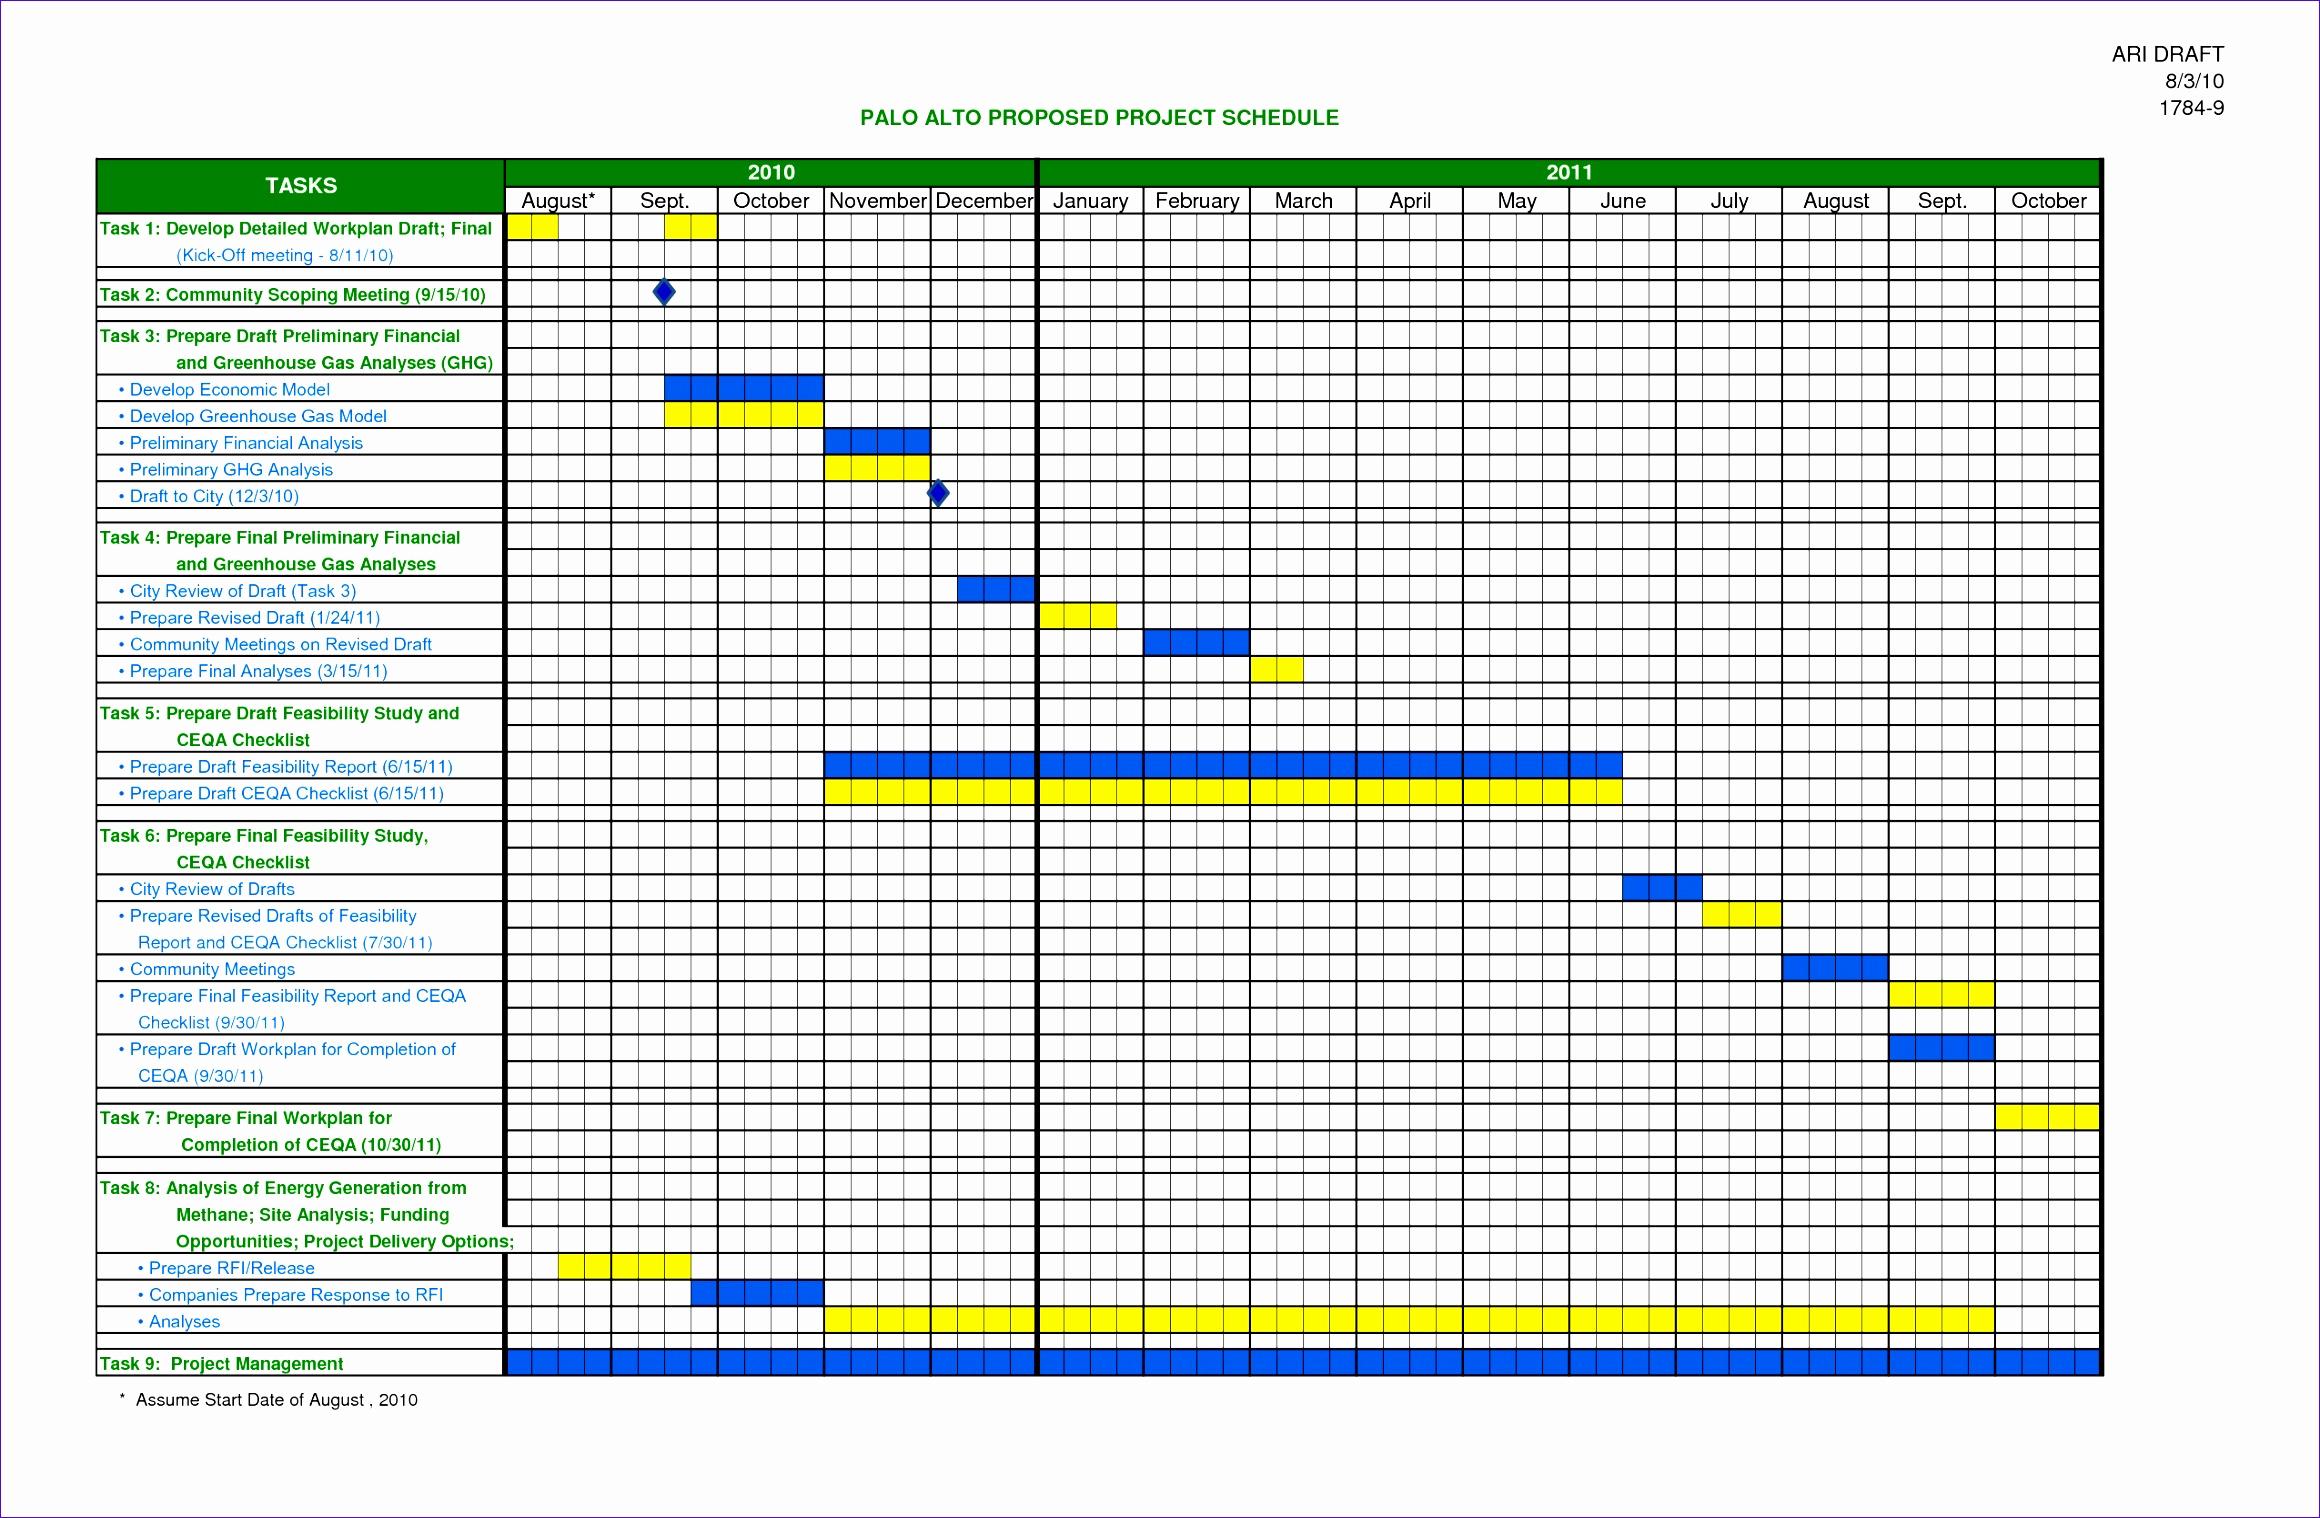 Project Schedule Template Excel Elegant 12 Project Planning Template Excel Free Exceltemplates